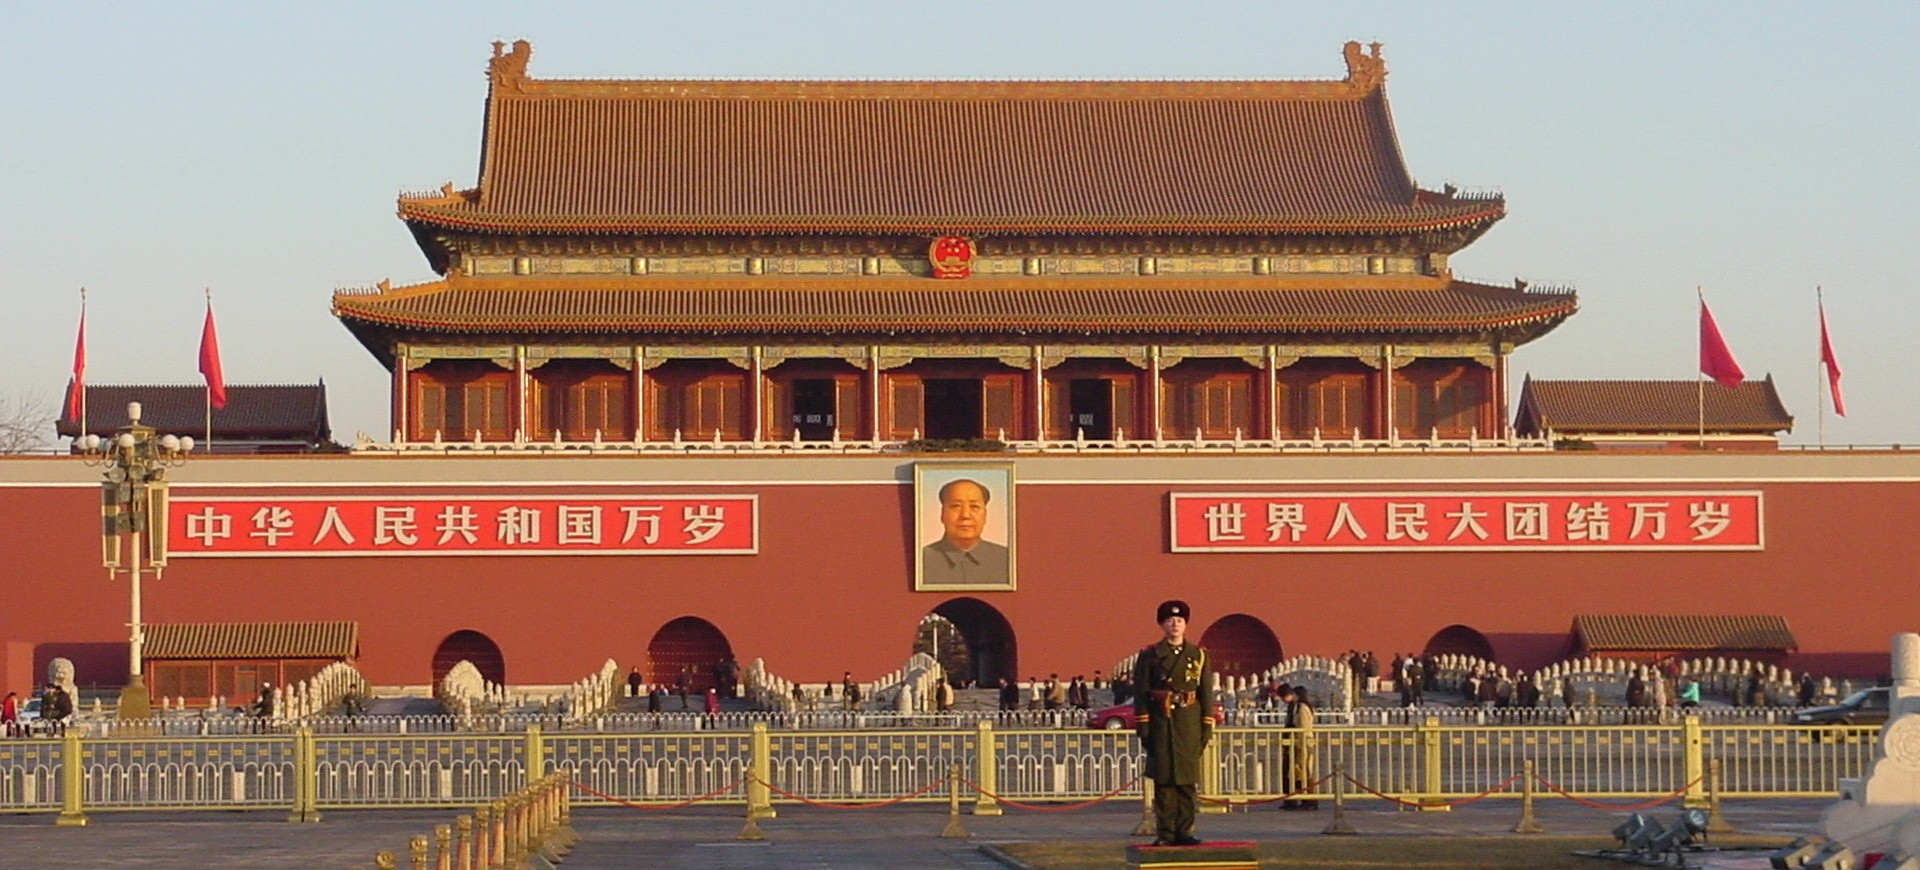 Chine Beijing Cité Interdite